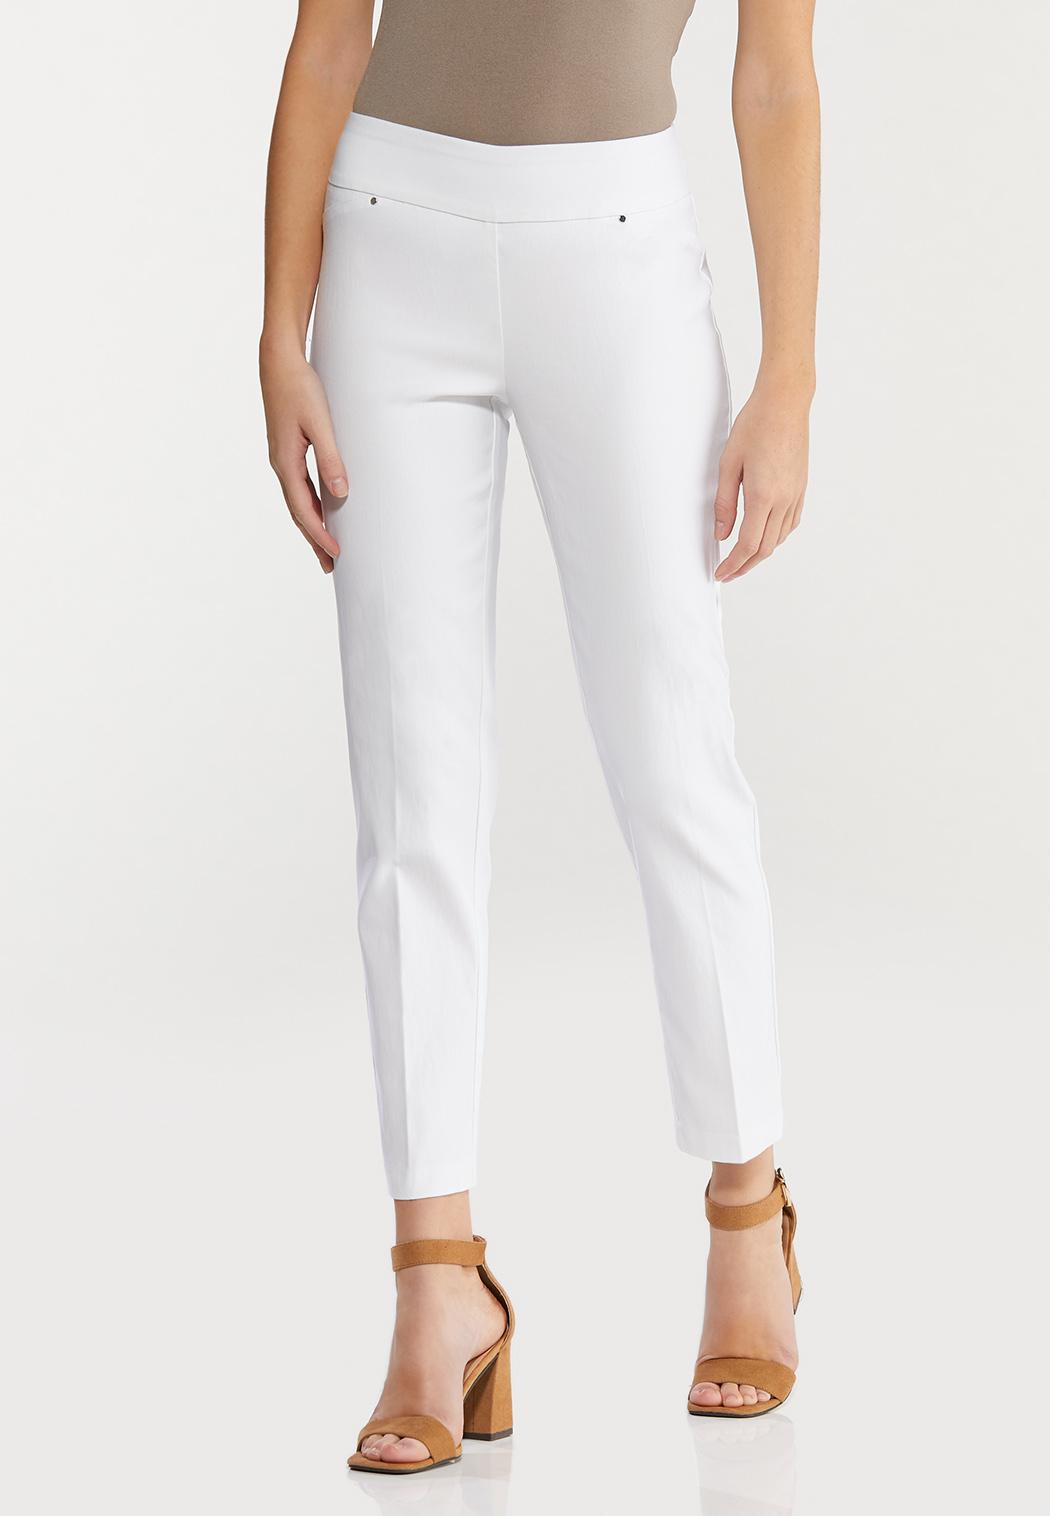 Petite Solid Bengaline Pants